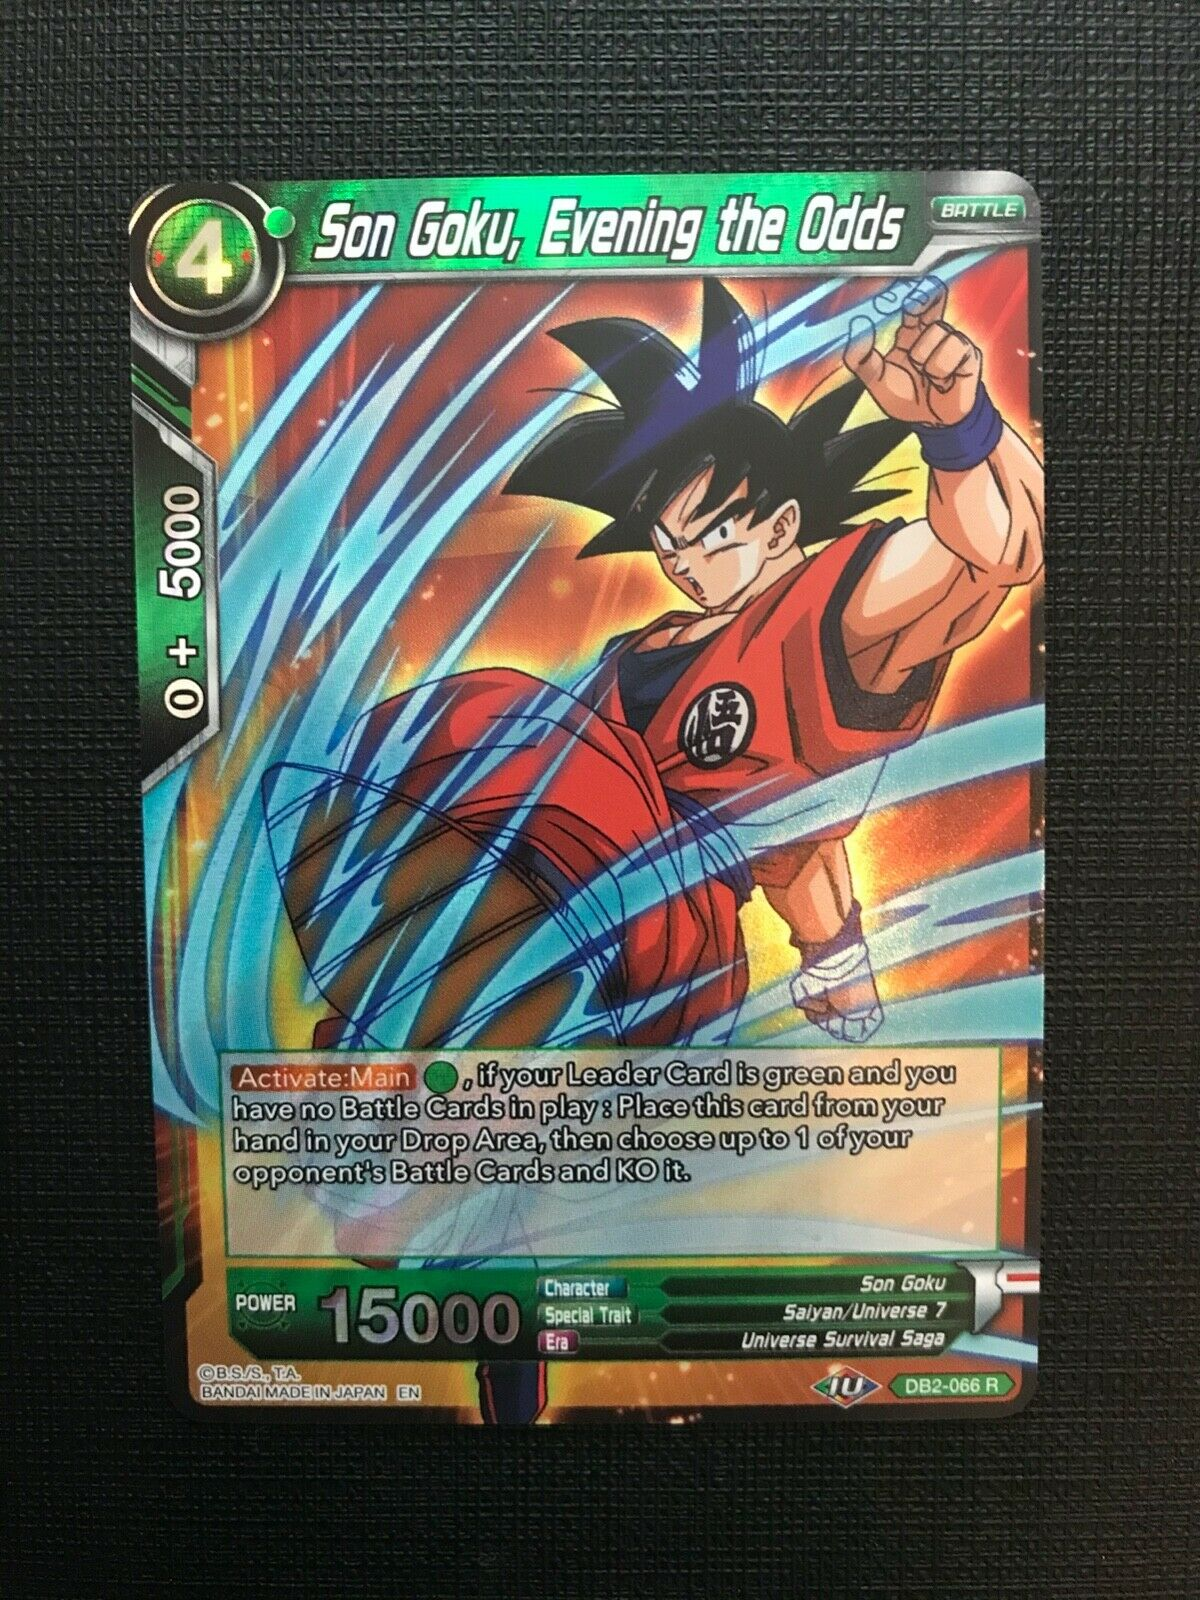 Rare Near Mint Dragonball Super Draft Box 5 DB2-164 Phantom Fist